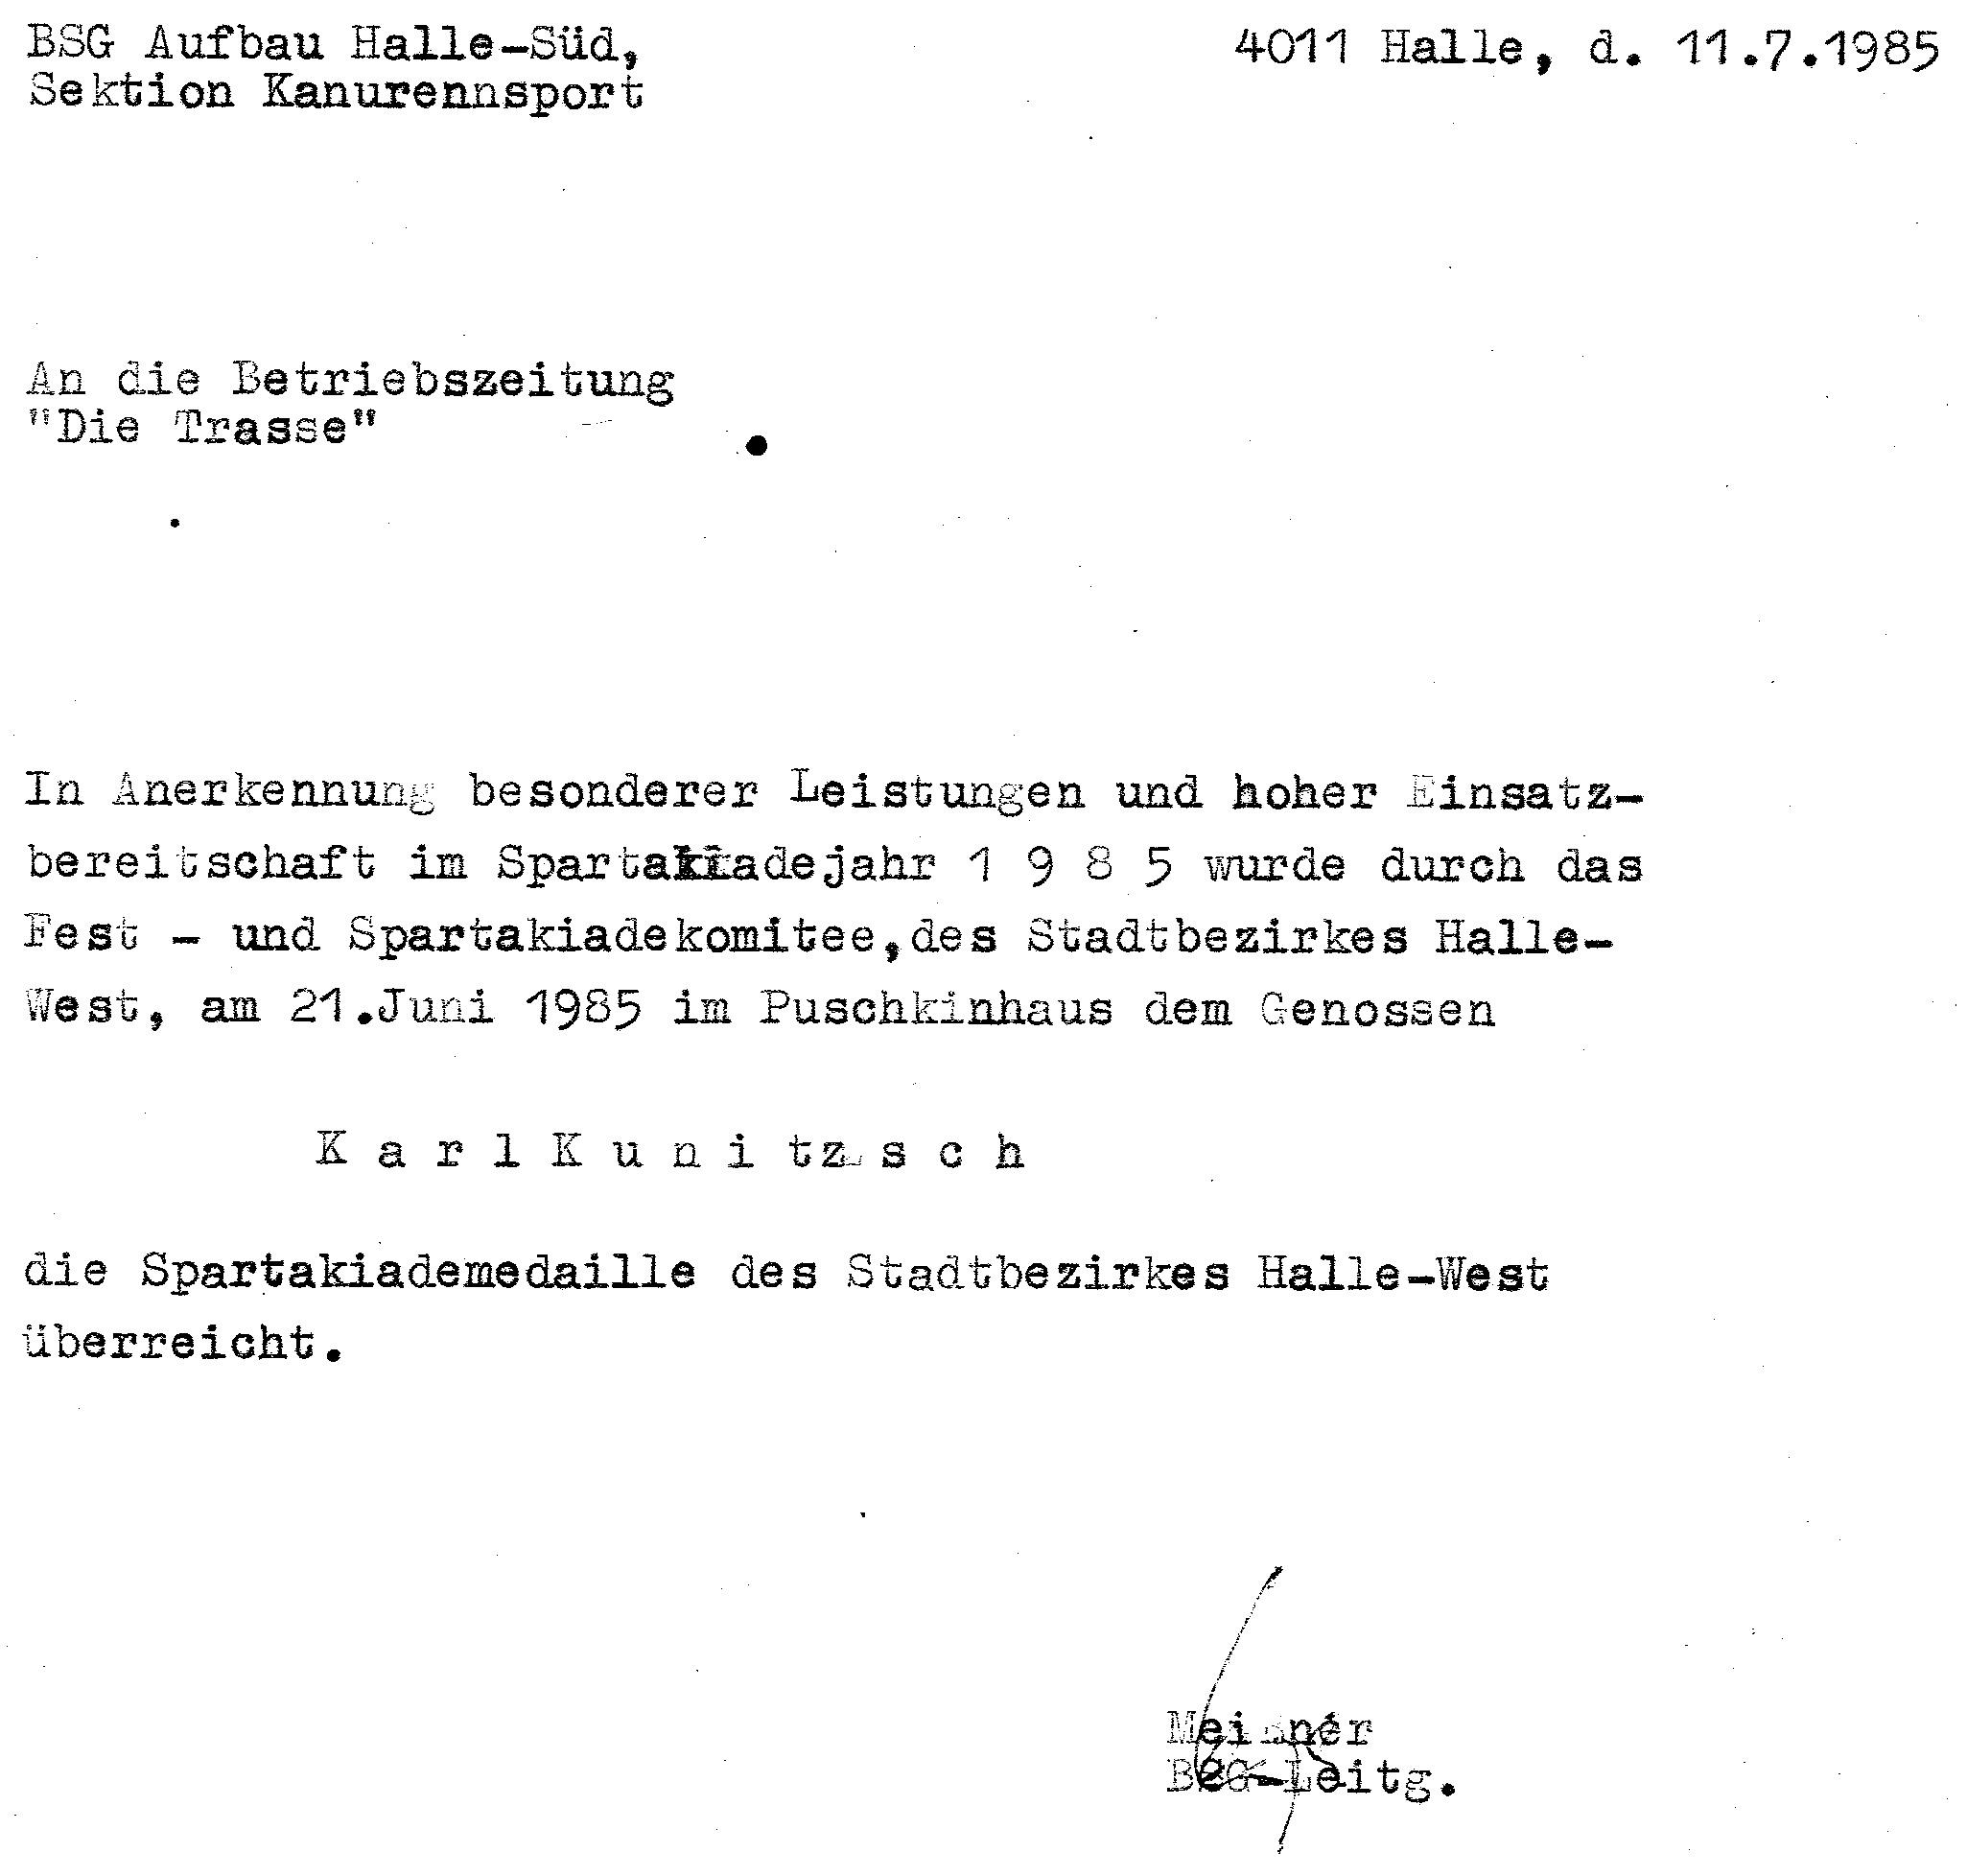 1985-07-11 Spartakiademedaille KK